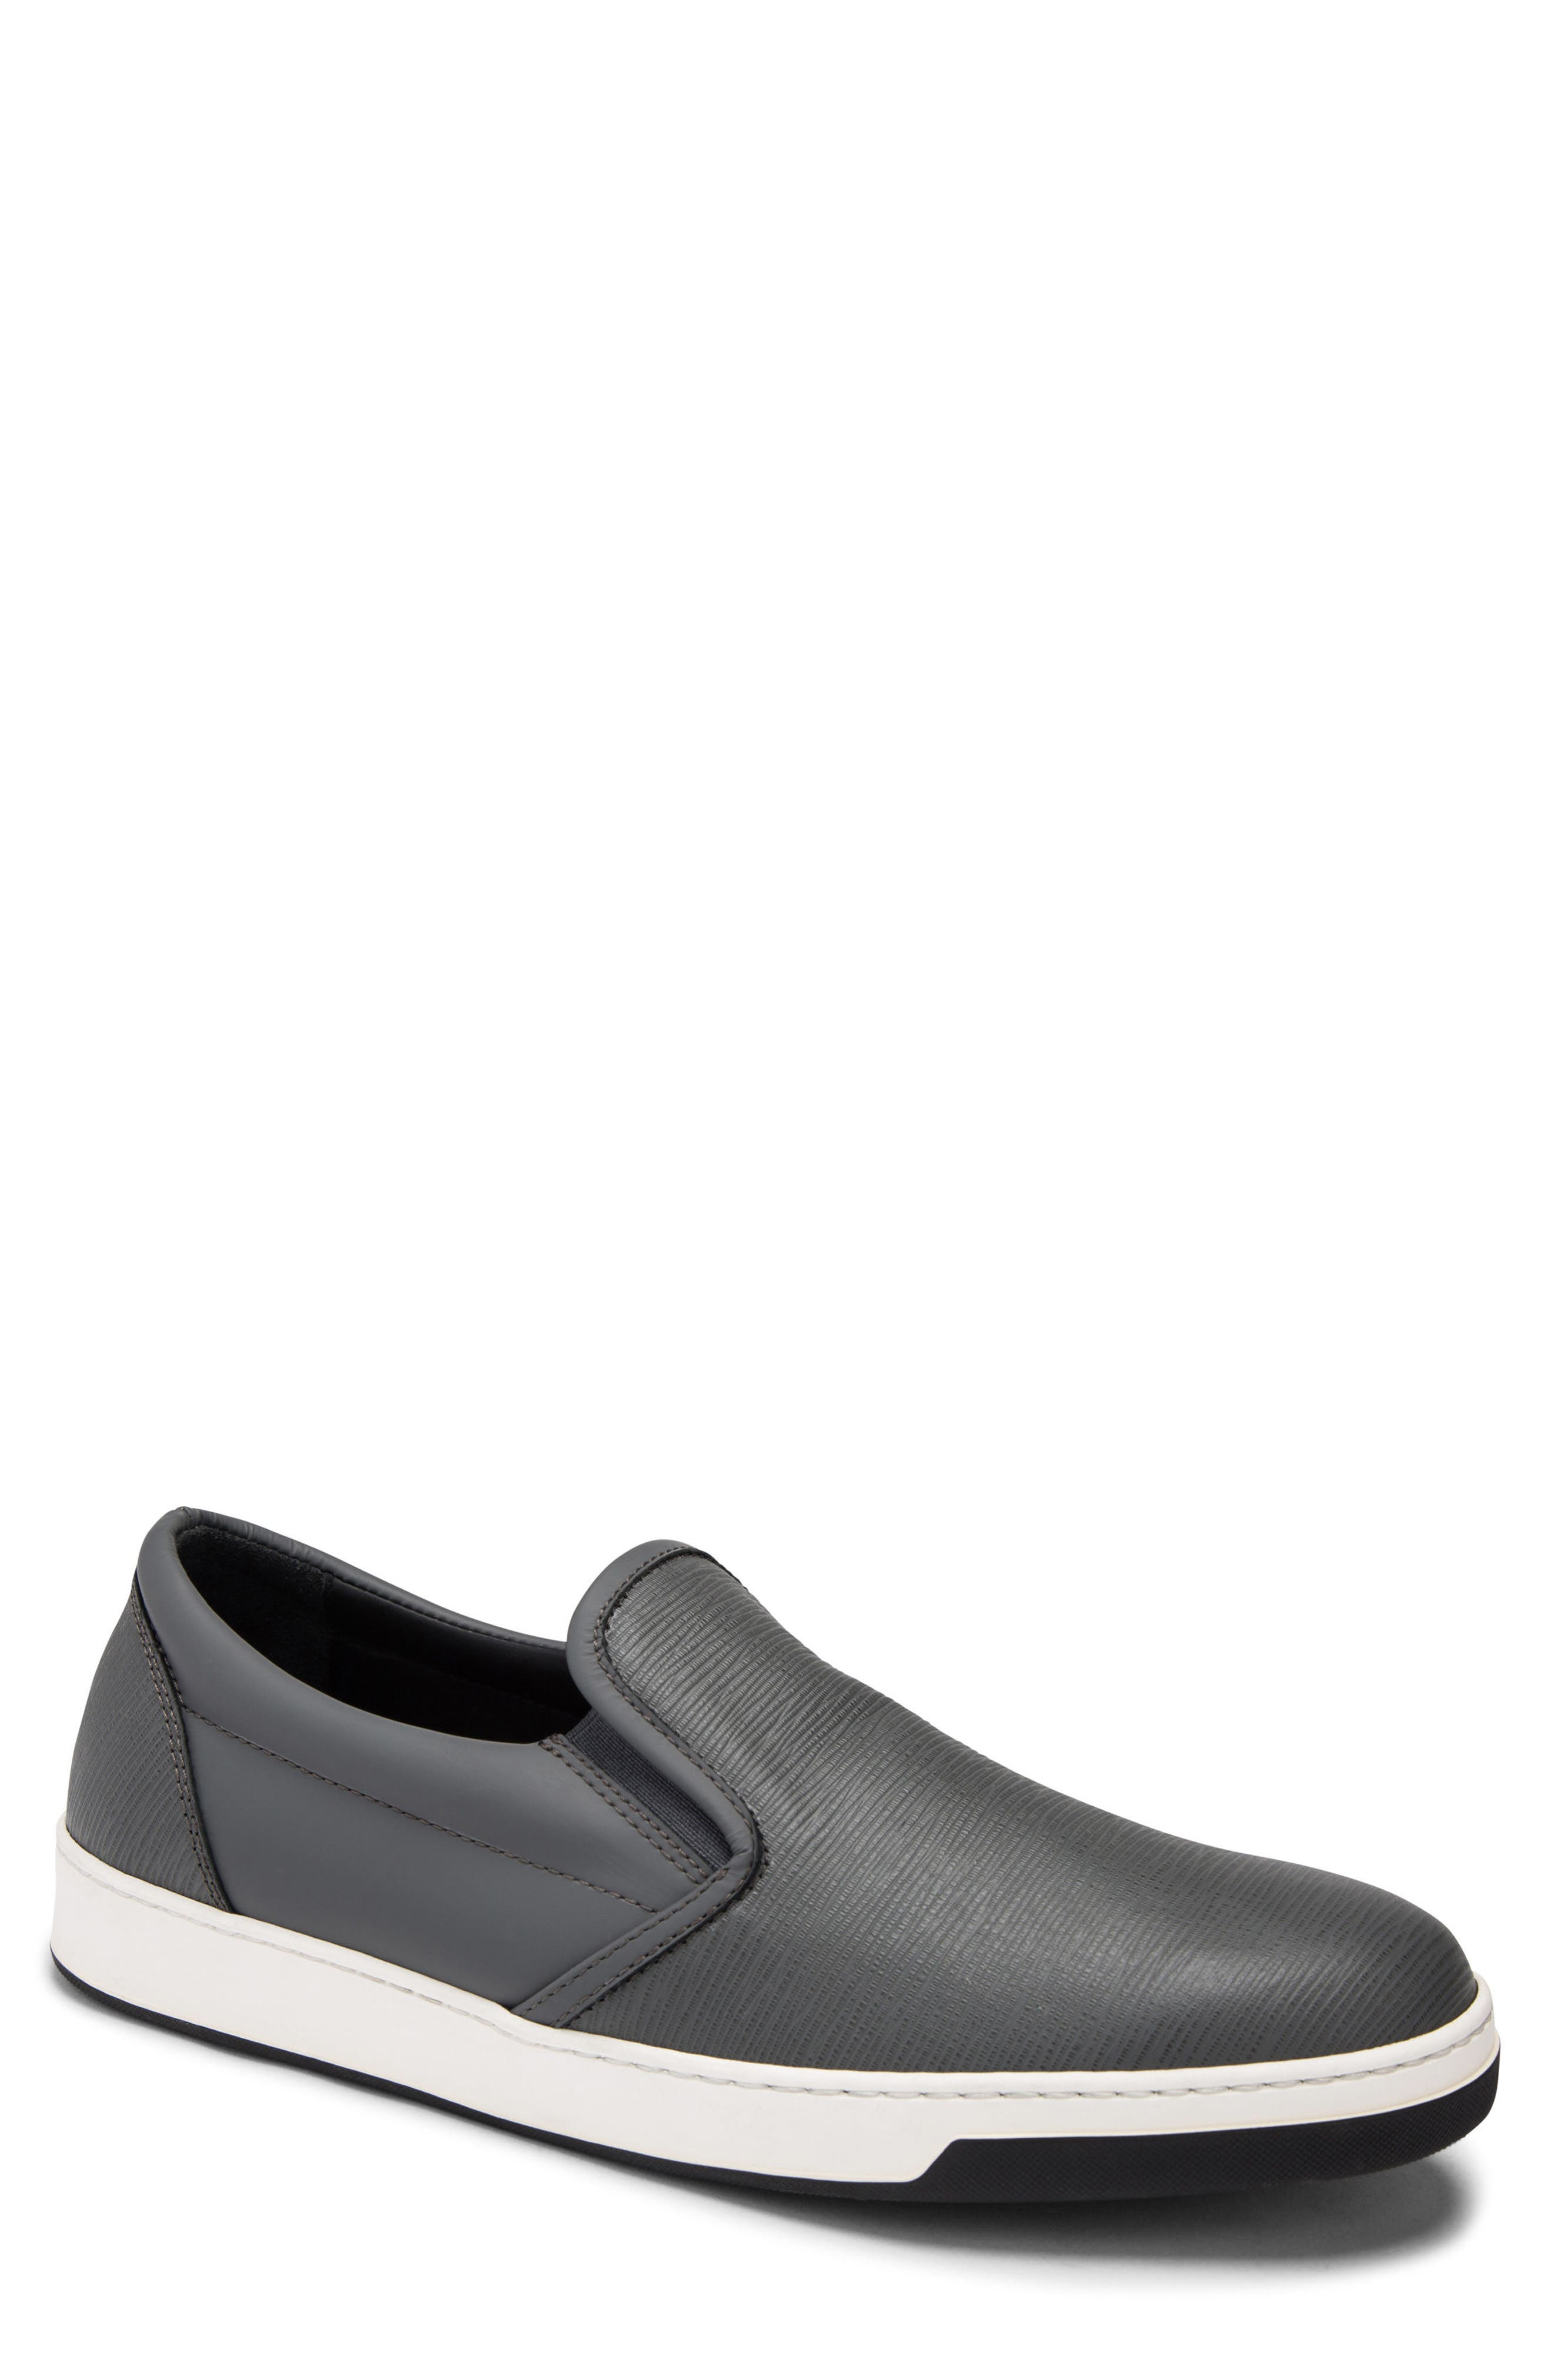 Santorini Slip-On Sneaker,                         Main,                         color, GRAFITE